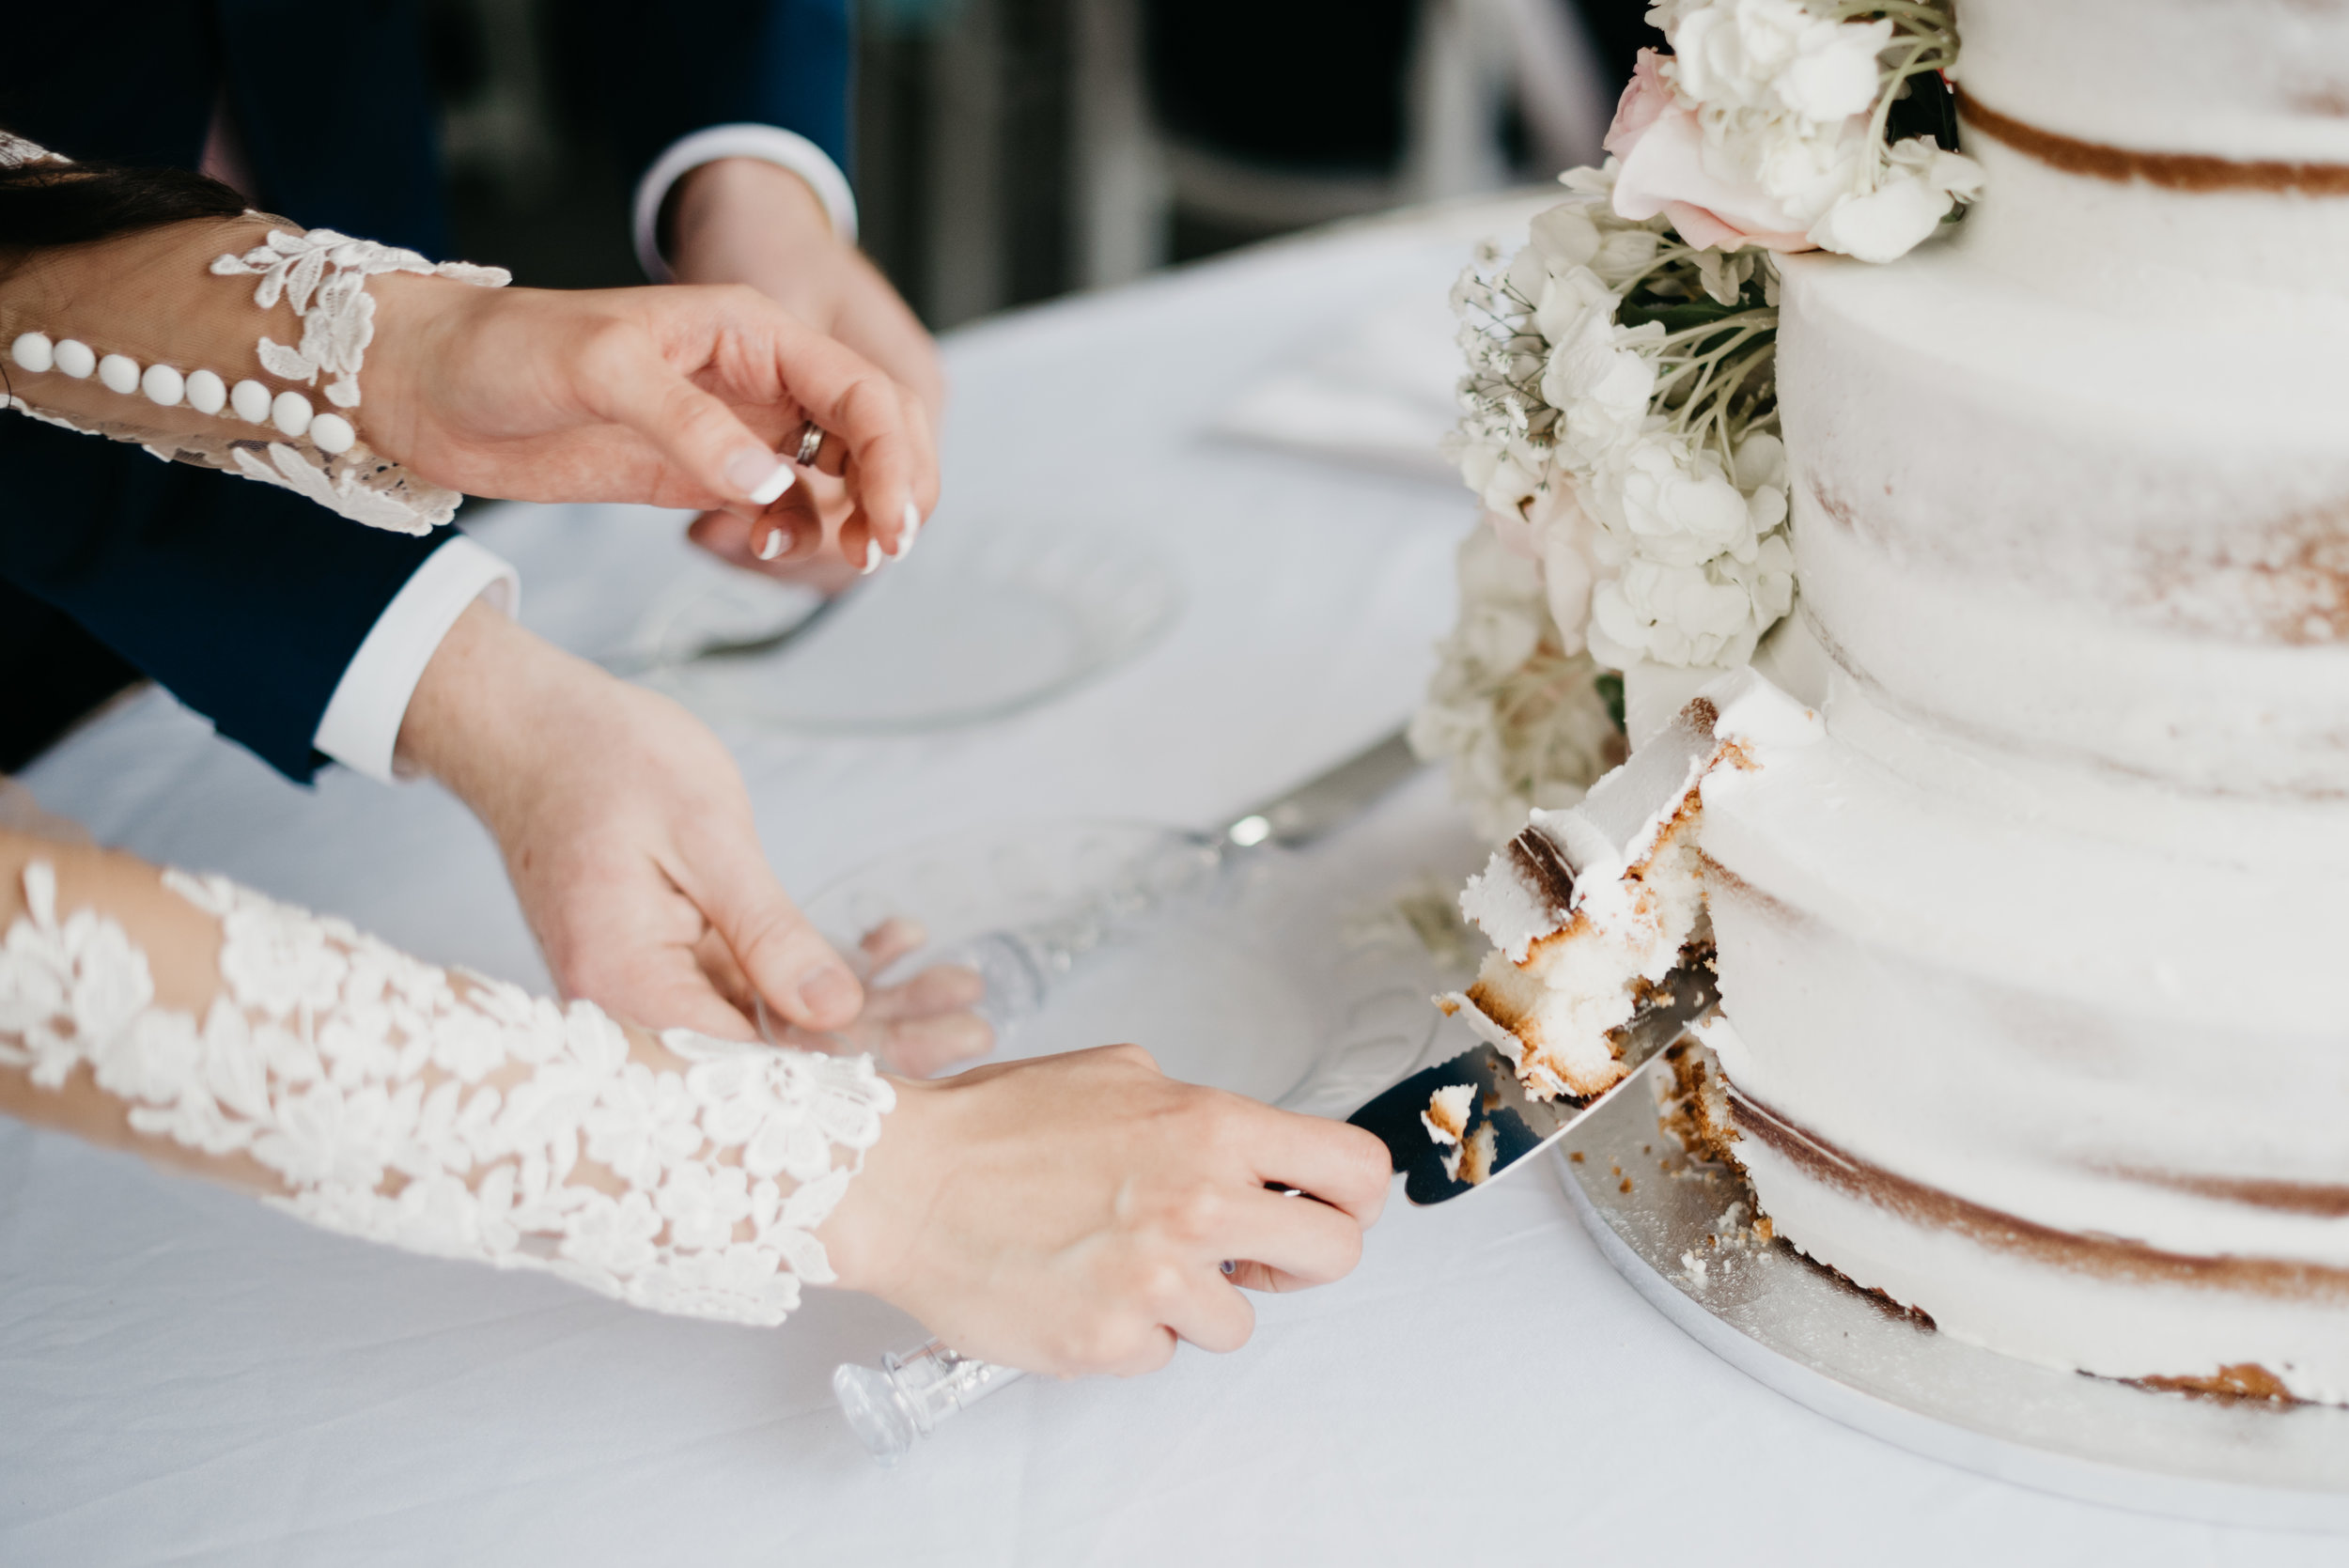 Barch-Massachusetts-Lakeside Tent Wedding-Western Massachusetts Wedding Photographer-02525.jpg